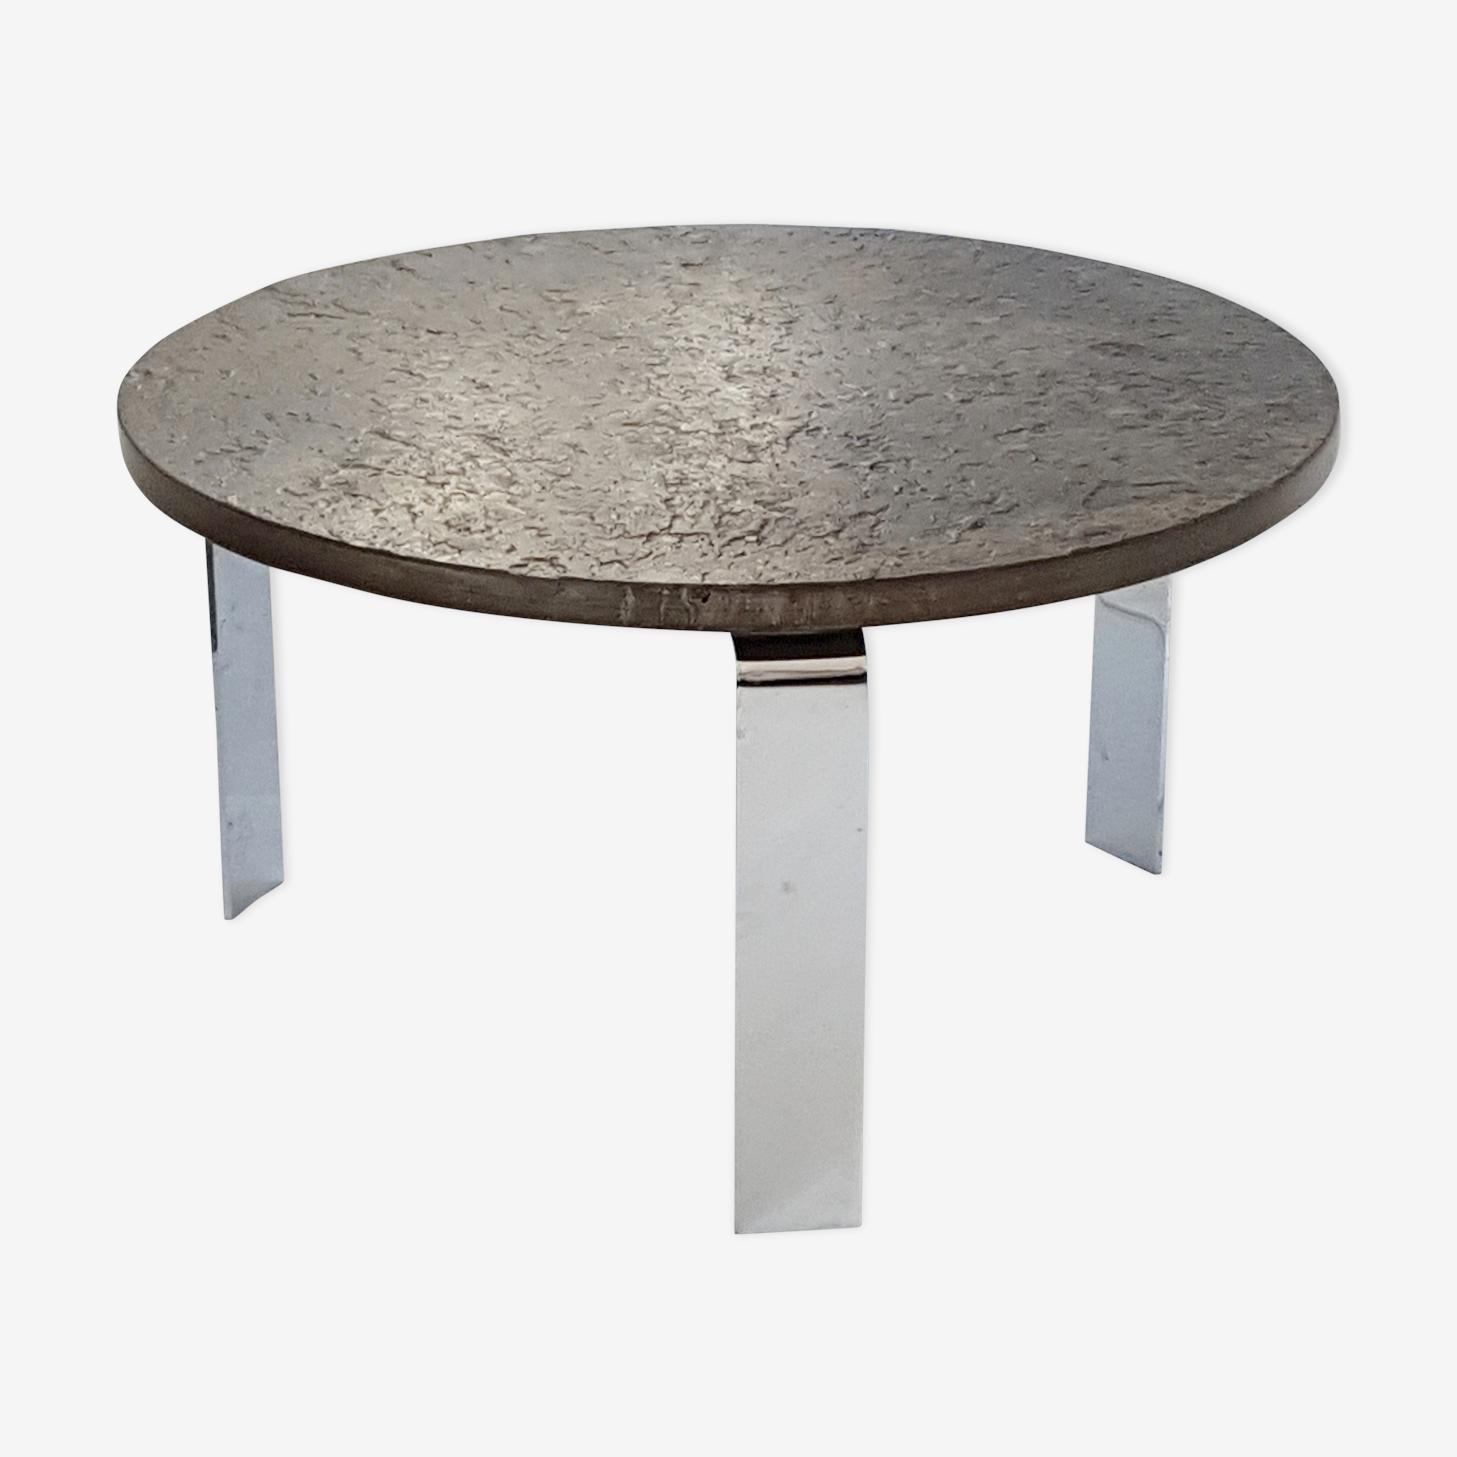 Vintage coffee table by Peter Draenert 1970